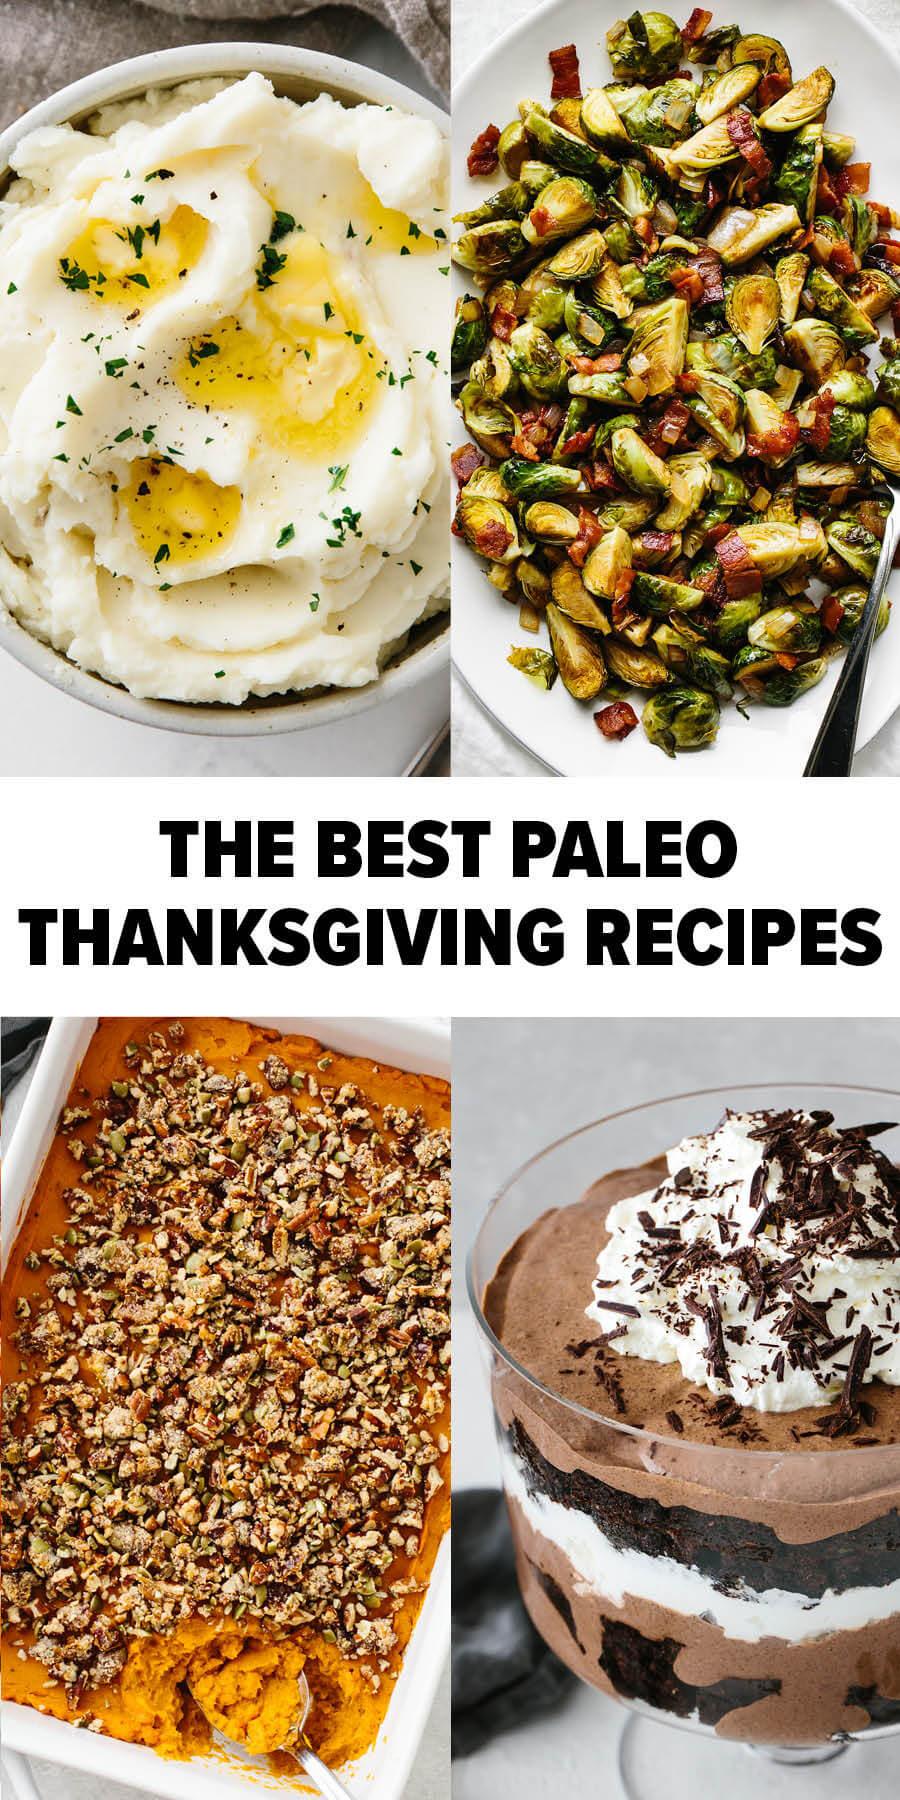 Best paleo thanksgiving recipes roundup